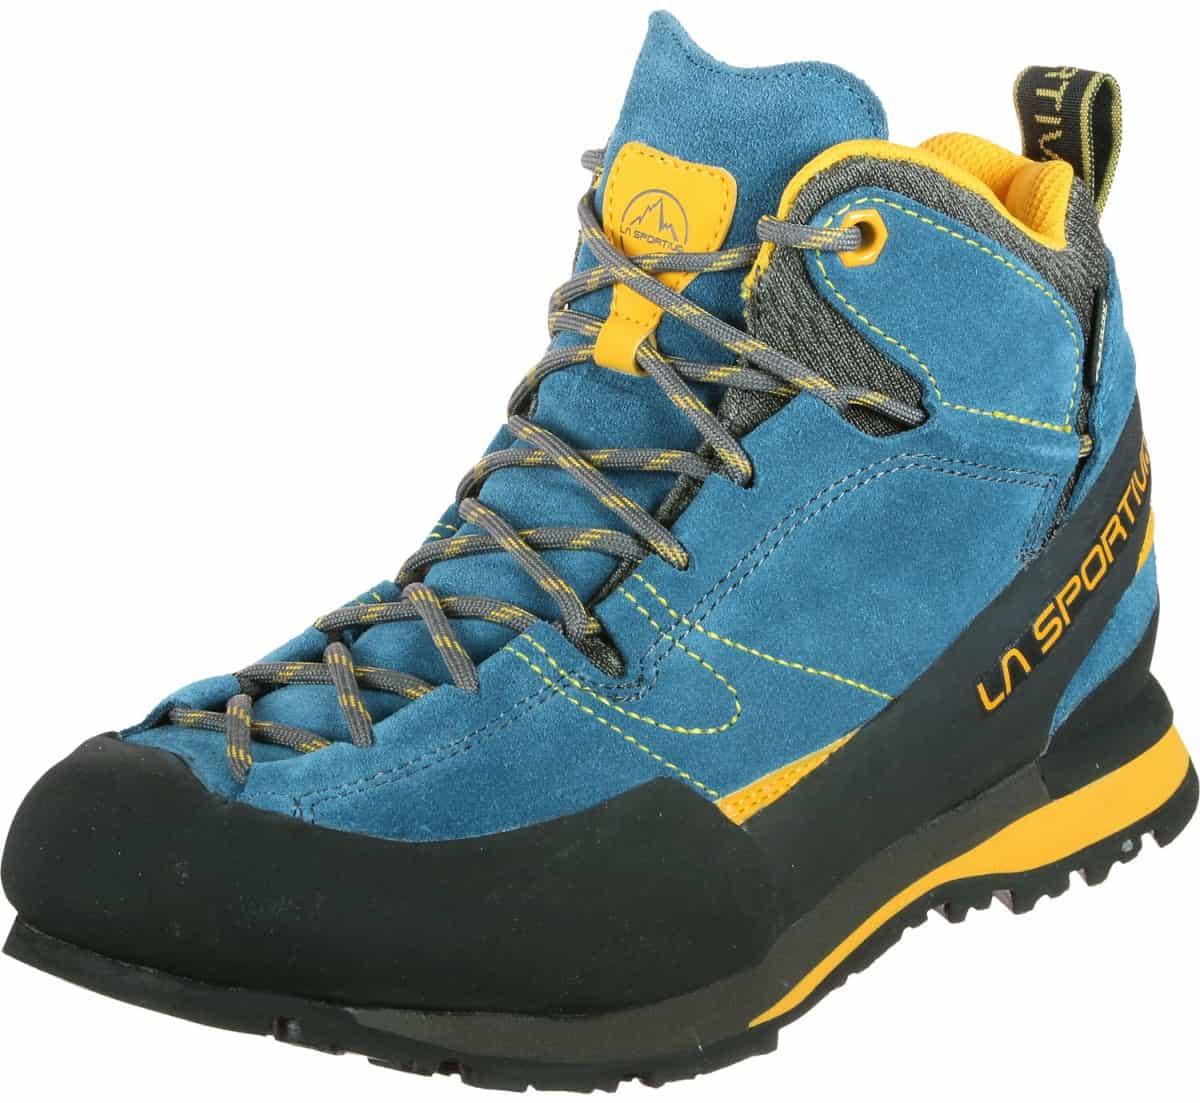 Sportiva Boulder X Mid Boots